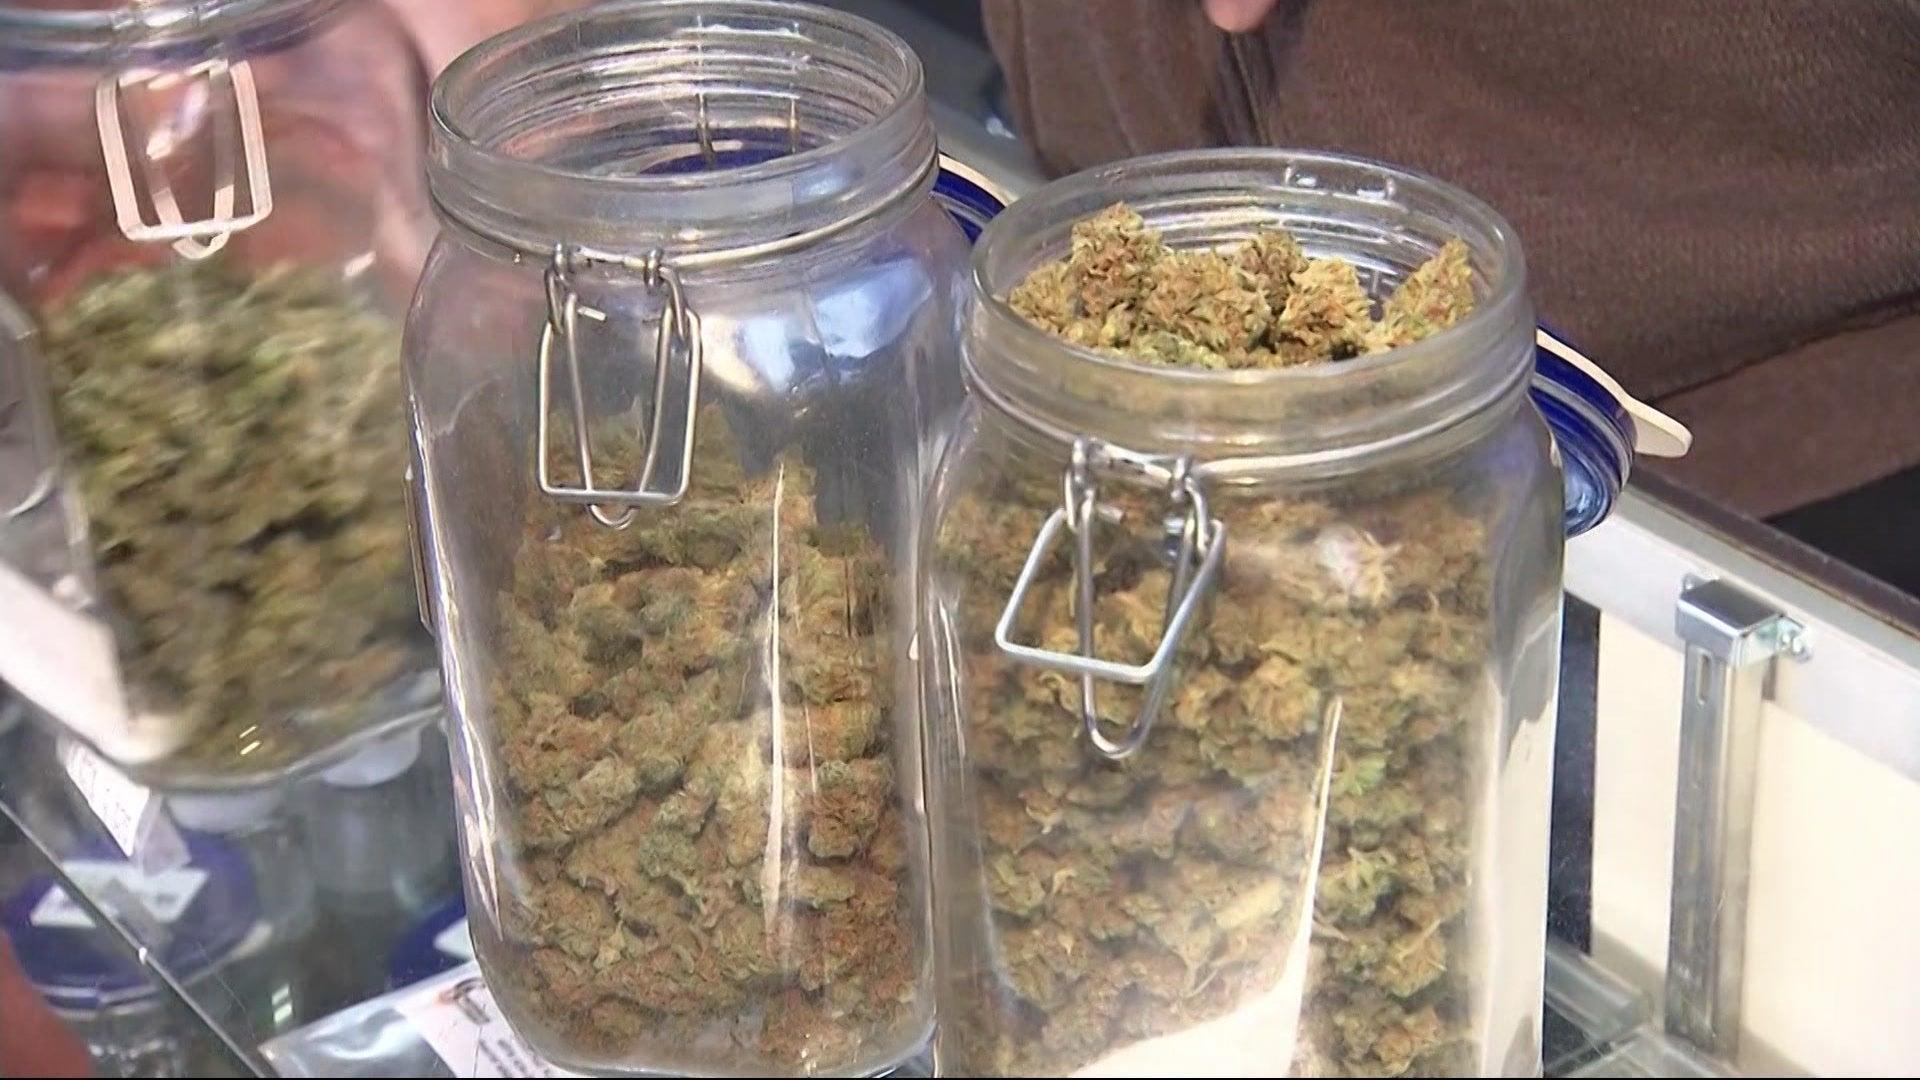 Company plans to transform former Hudson Valley prison into $150 million marijuana cultivation center